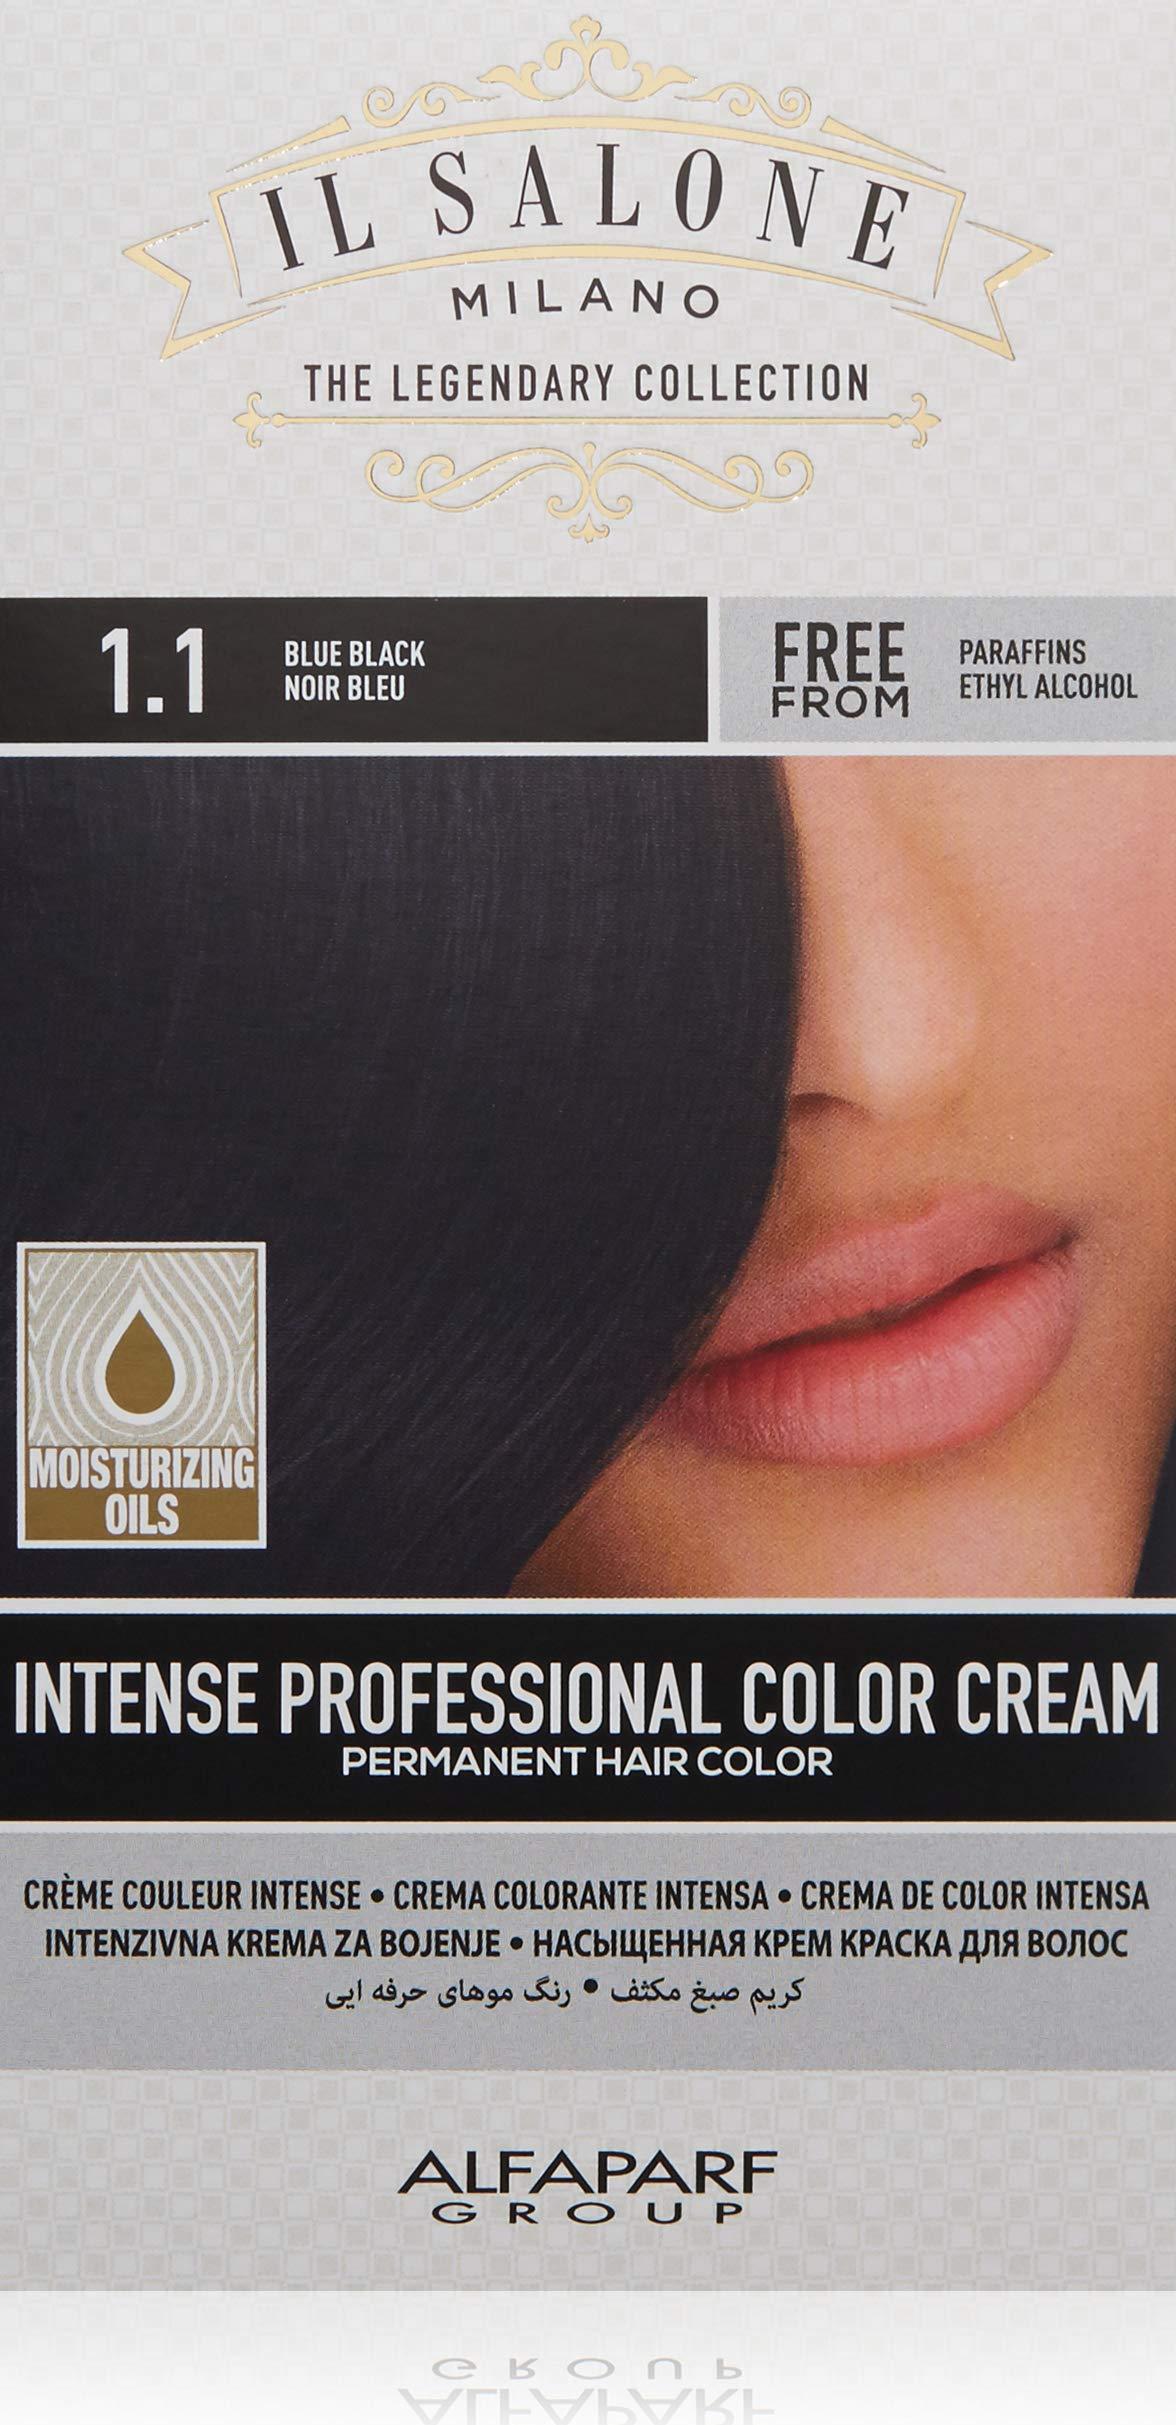 Il Salone Milano Permanent Hair Color Cream - 1.1 Blue Black Hair Dye - Professional Salon - Premium Quality - 100% Gray Coverage - Paraffin Free - Ethyl Alcohol Free - Moisturizing Oils